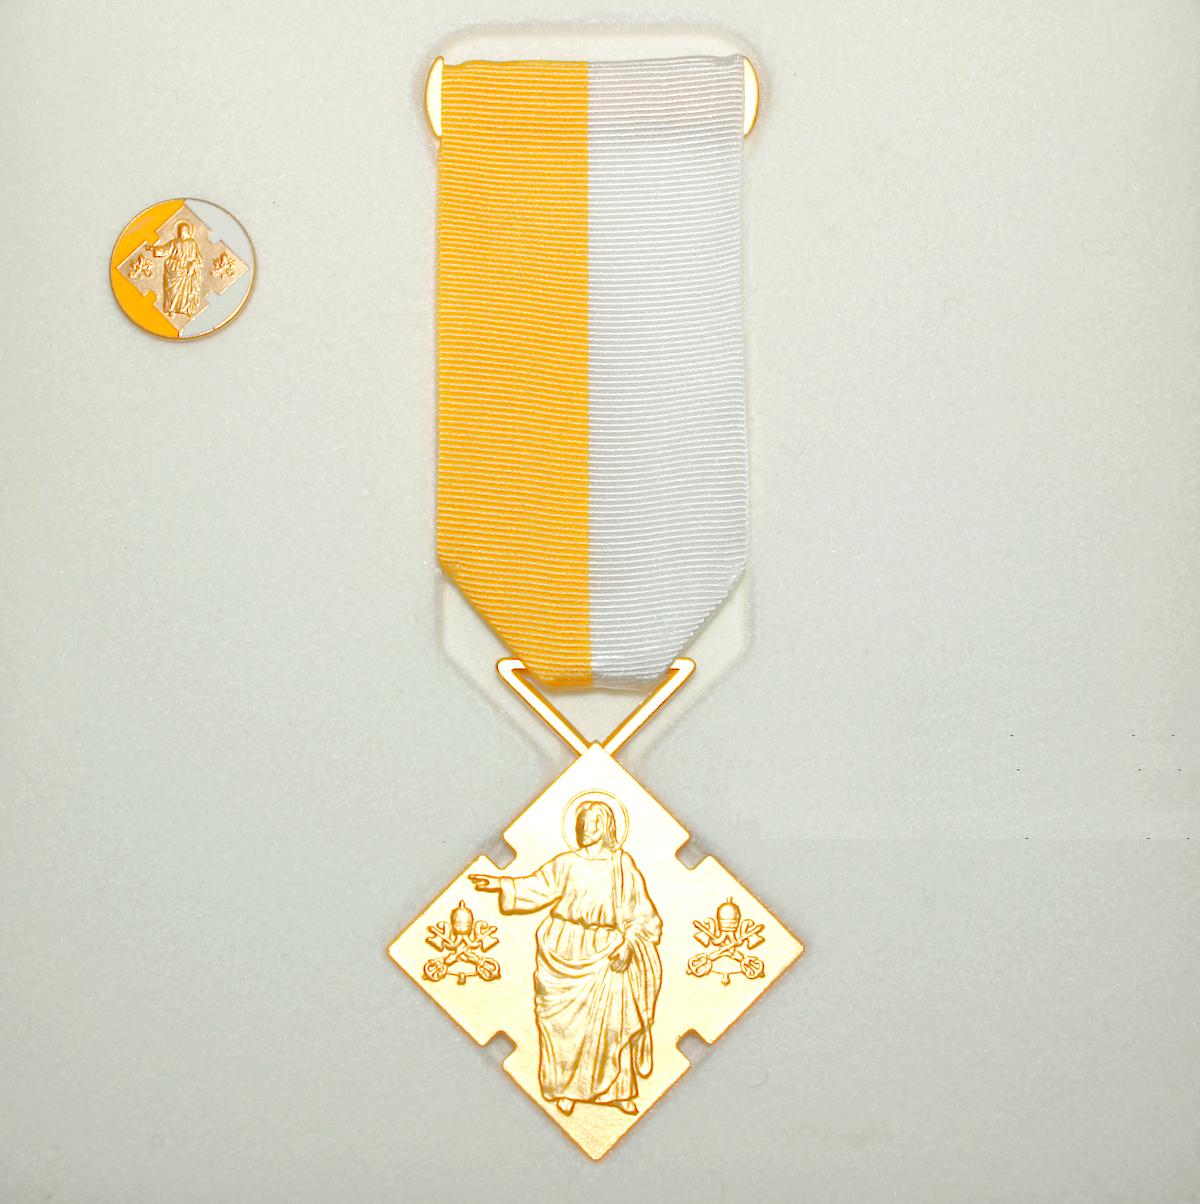 Benemerenti Medal Front